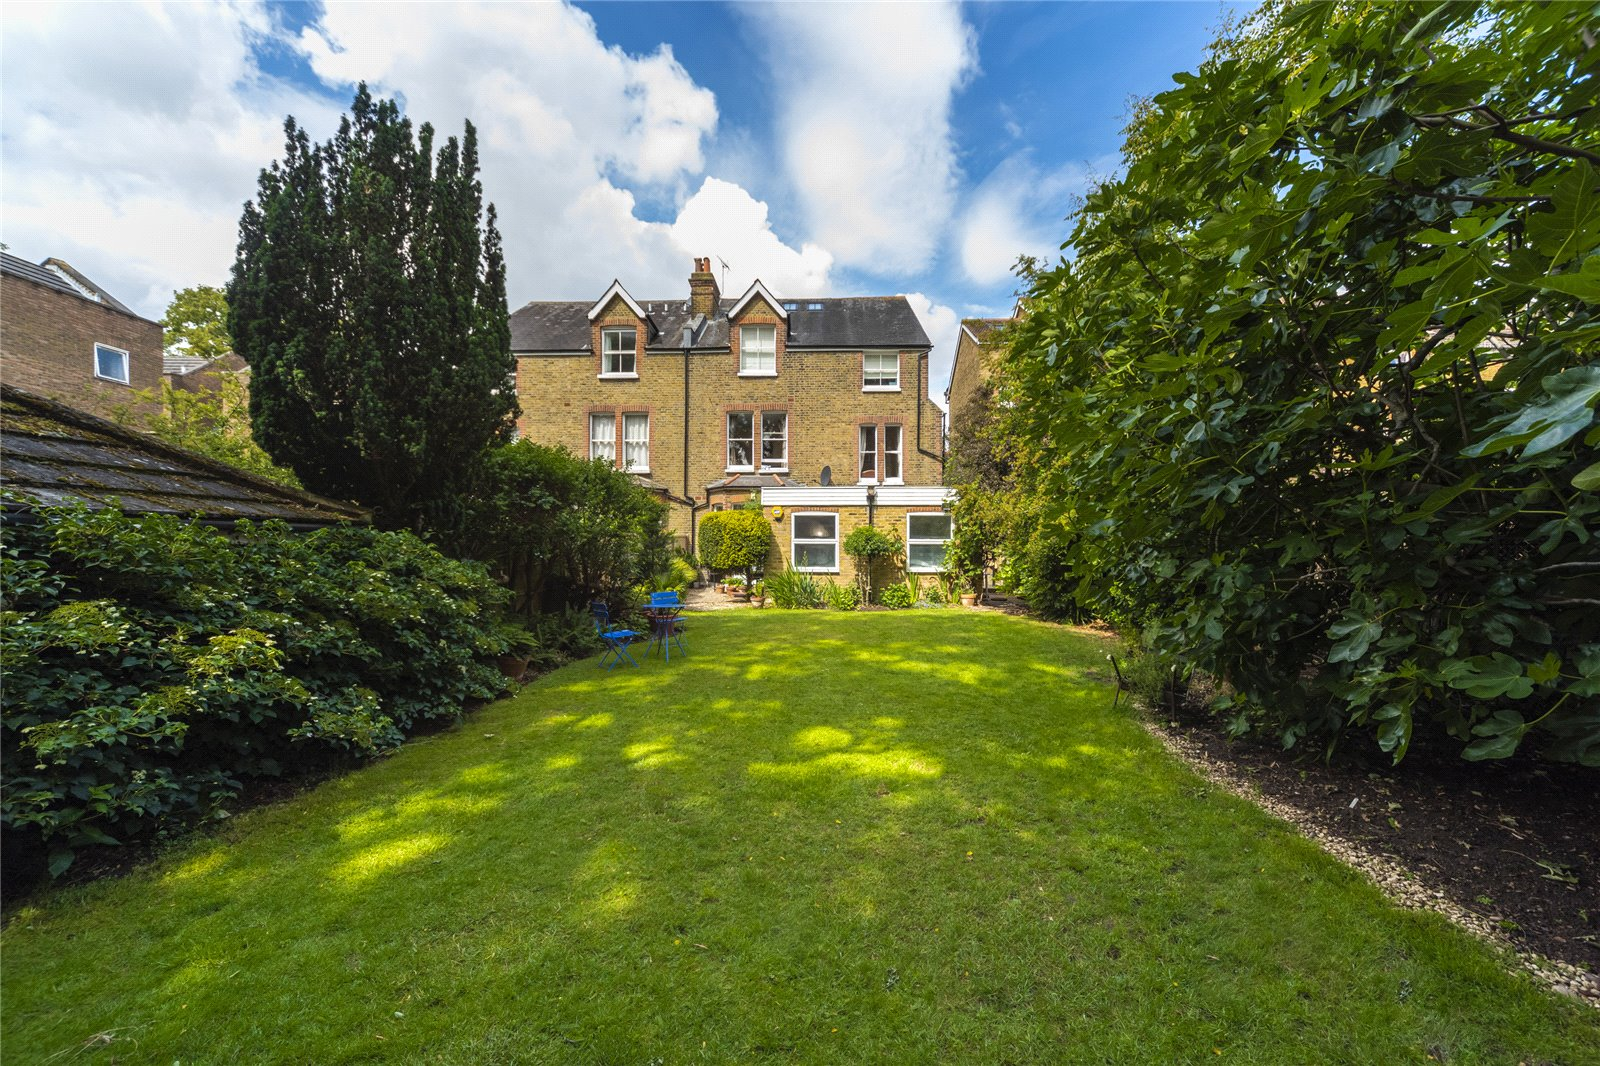 Lion Gate Gardens, Kew, TW9 2DW - Antony Roberts